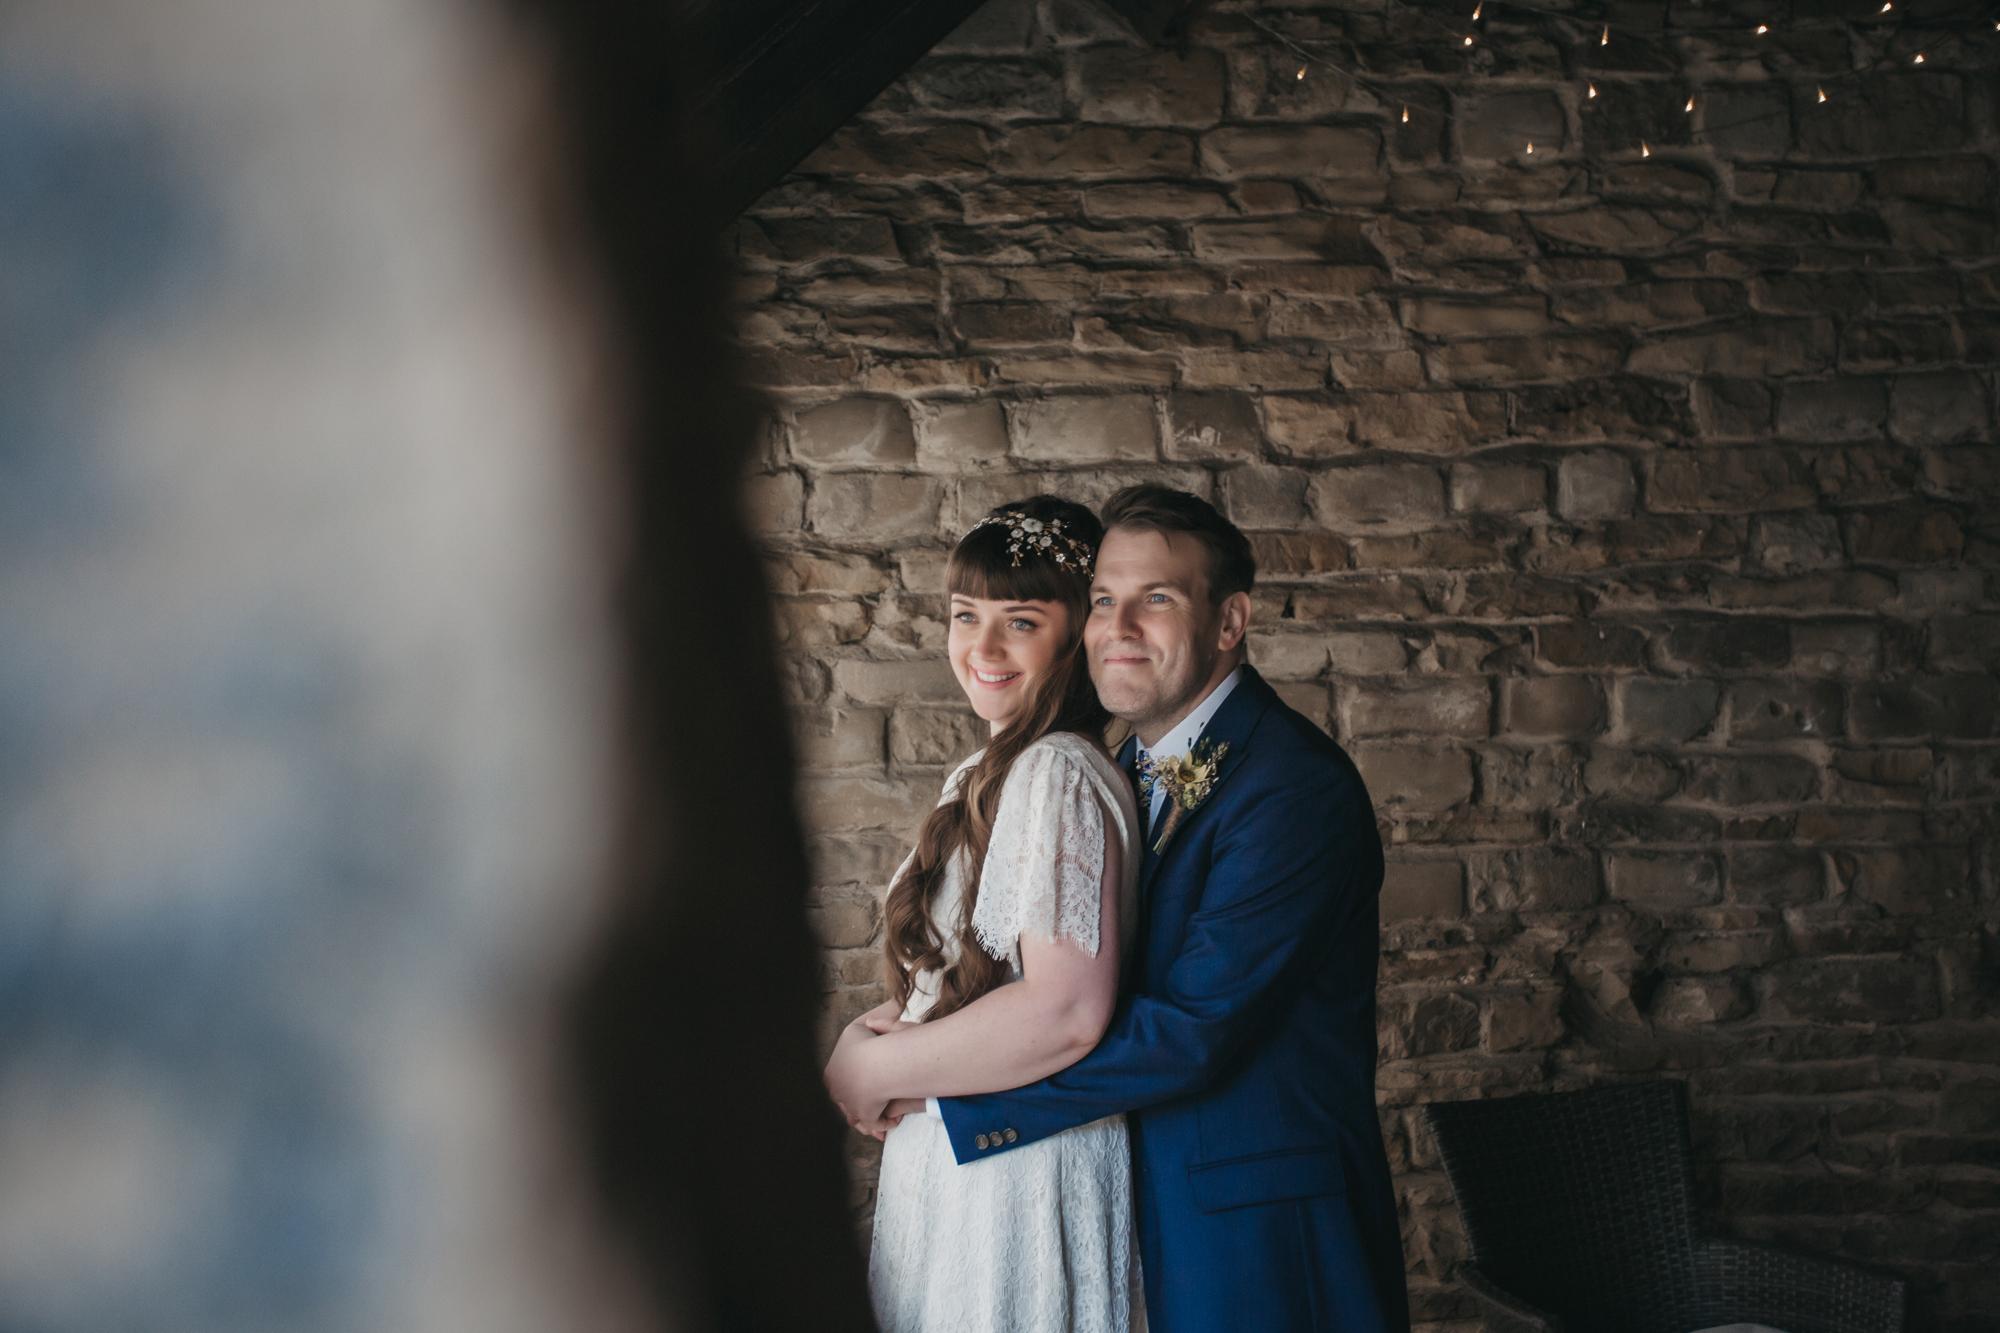 Kristy-Back-Garden-Outdoor-Wedding-Sheffield-Industrial-Warehouse-Wedding-Bohemian-Kate-Beaumont-Dahlia-Dress-32.jpg